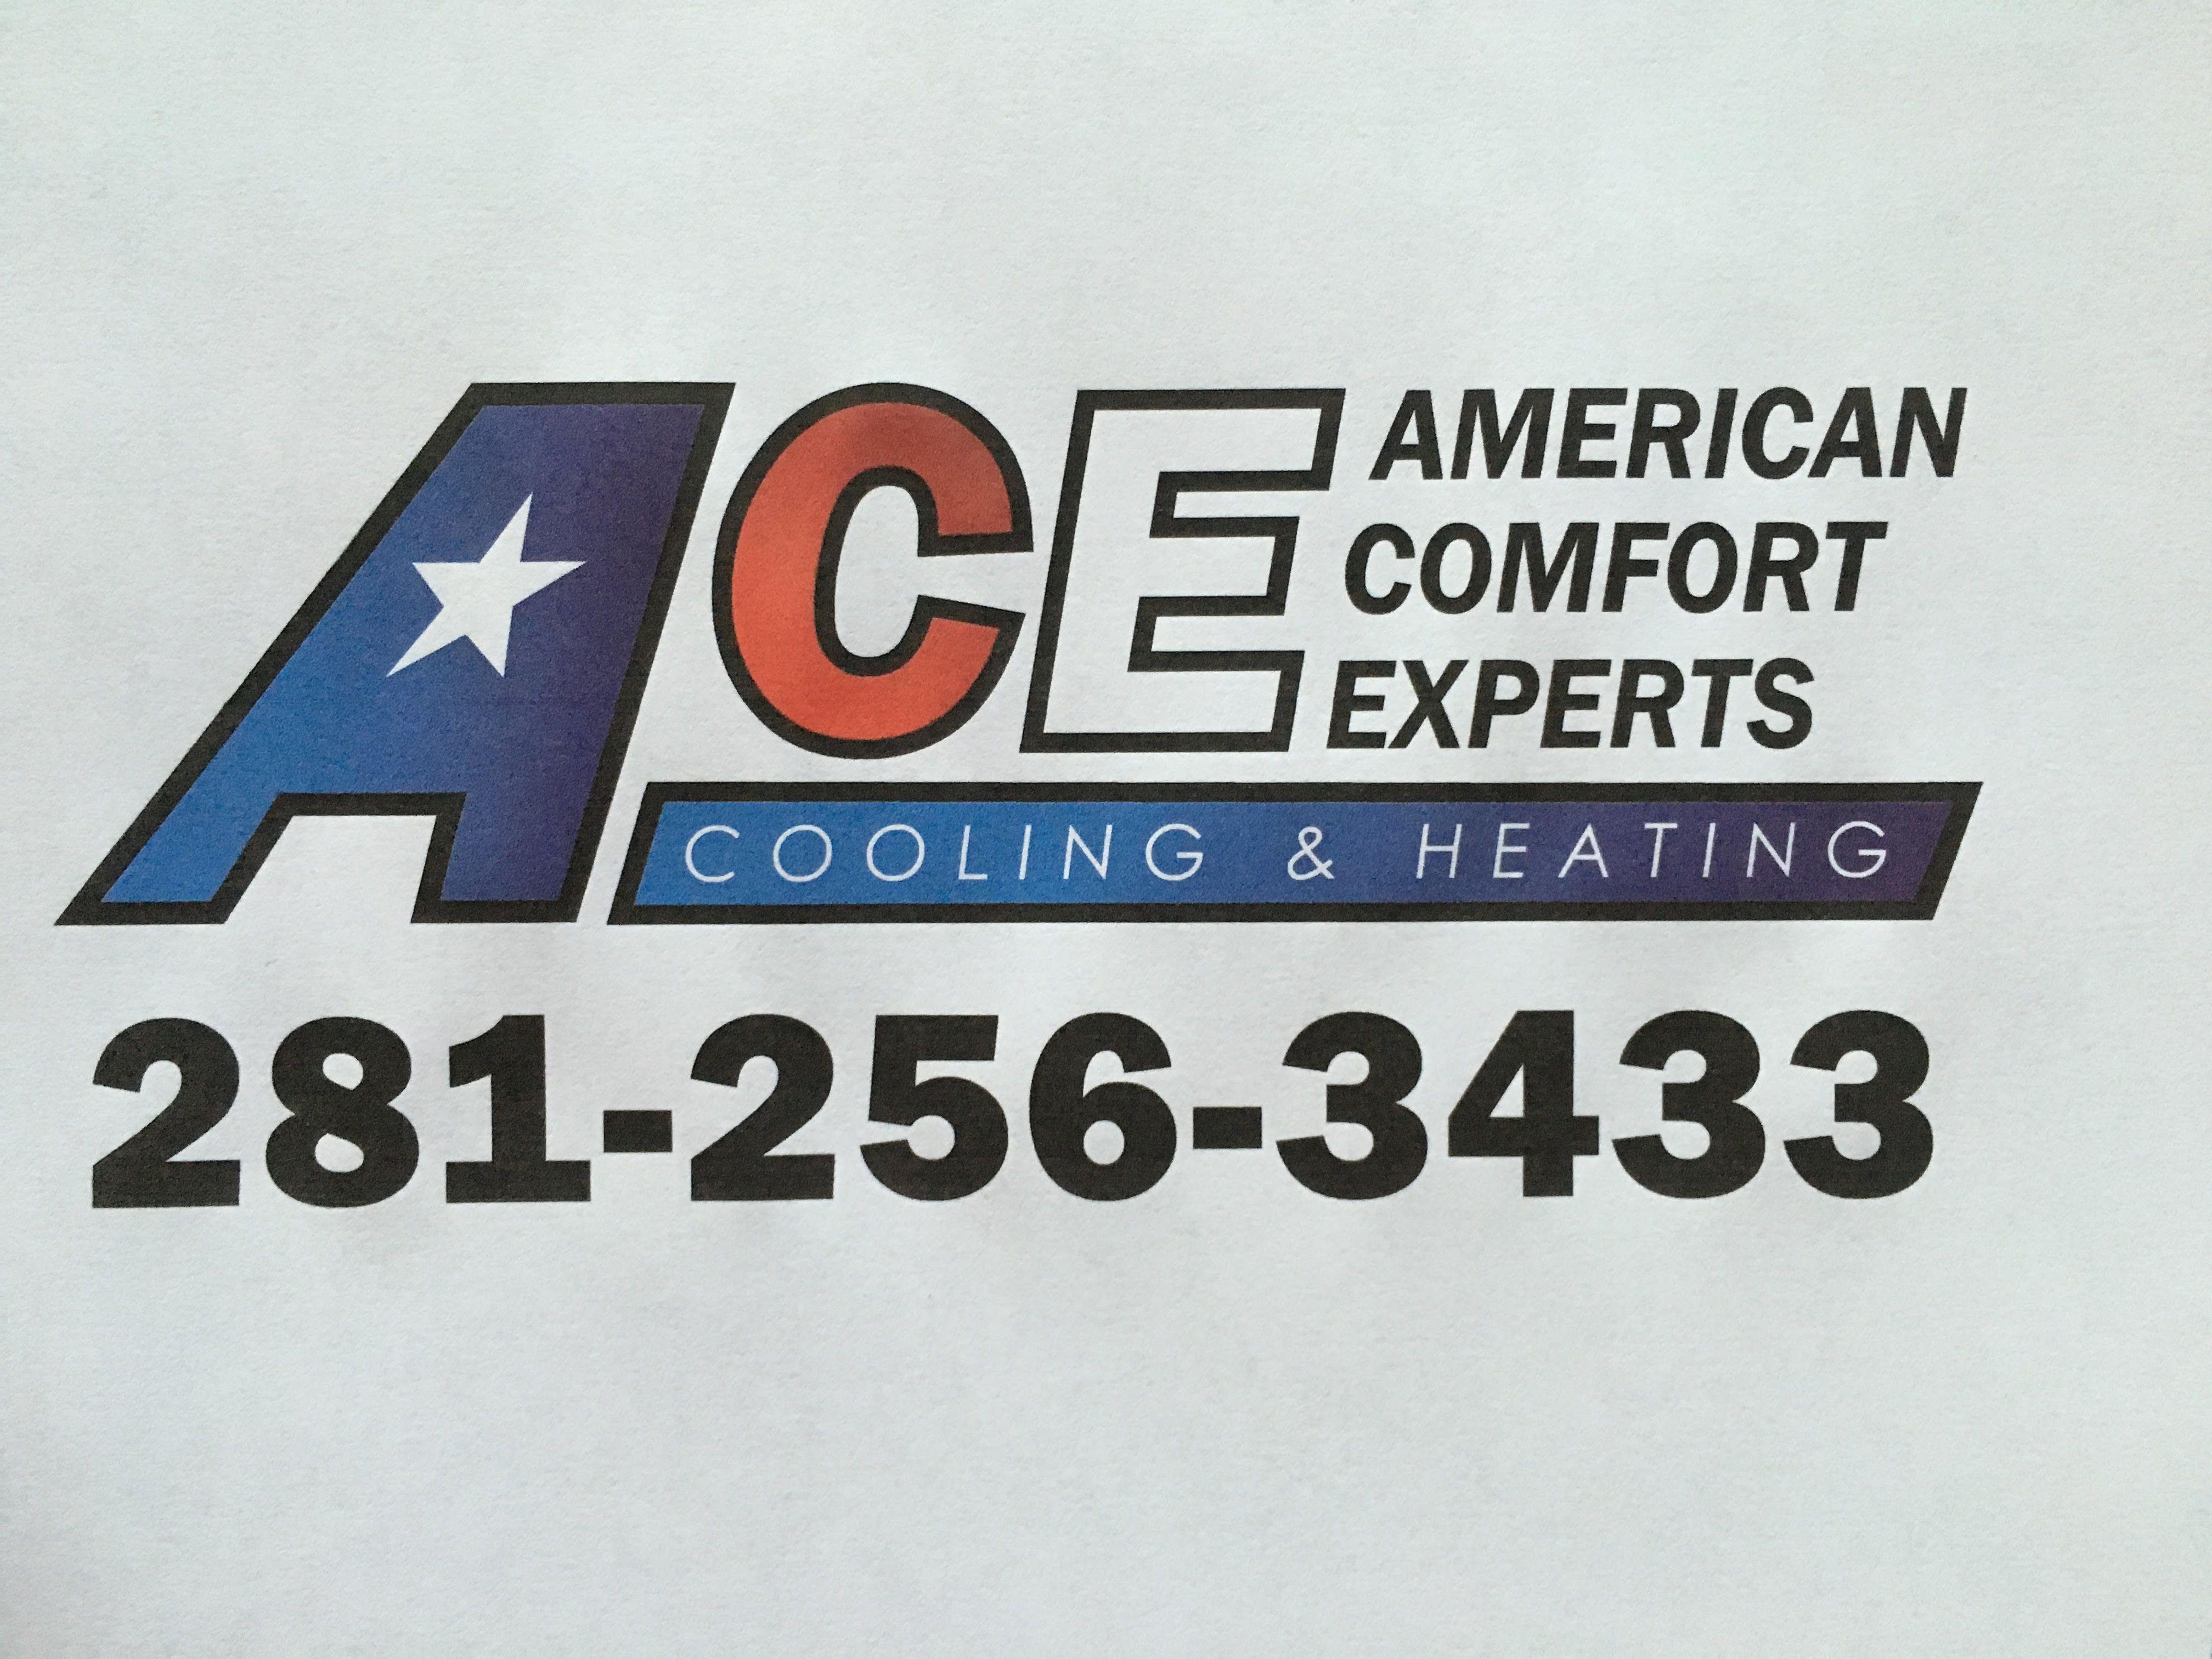 American comfort experts customer testimonials prove that